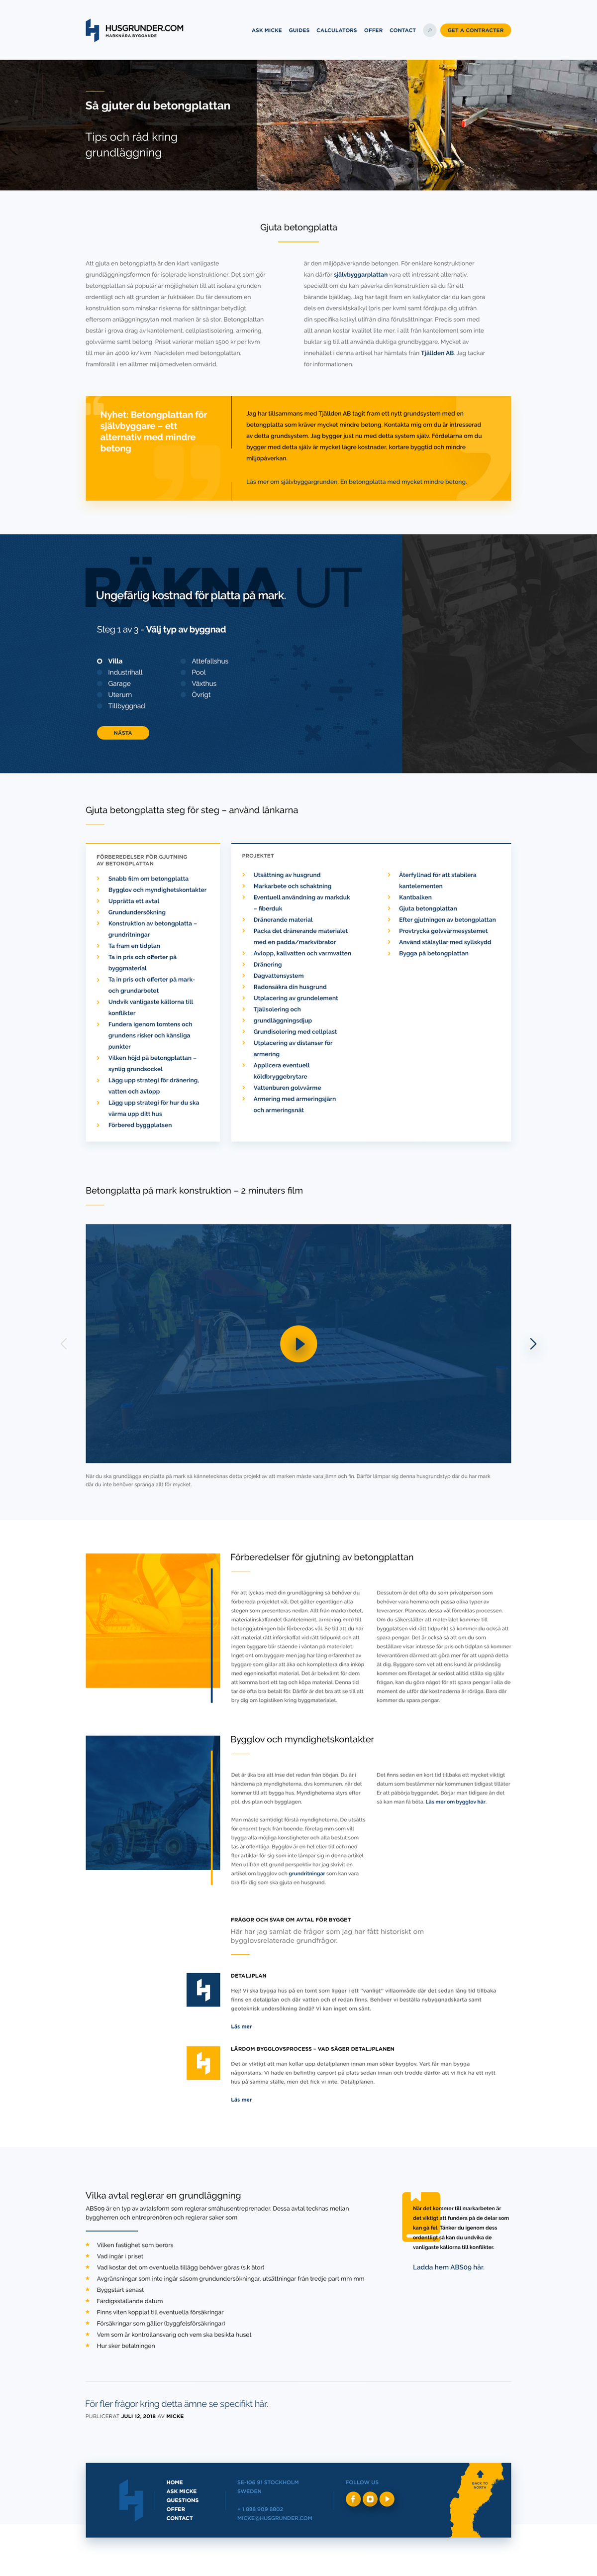 Husgrunder.com: Redesign of landingpage template